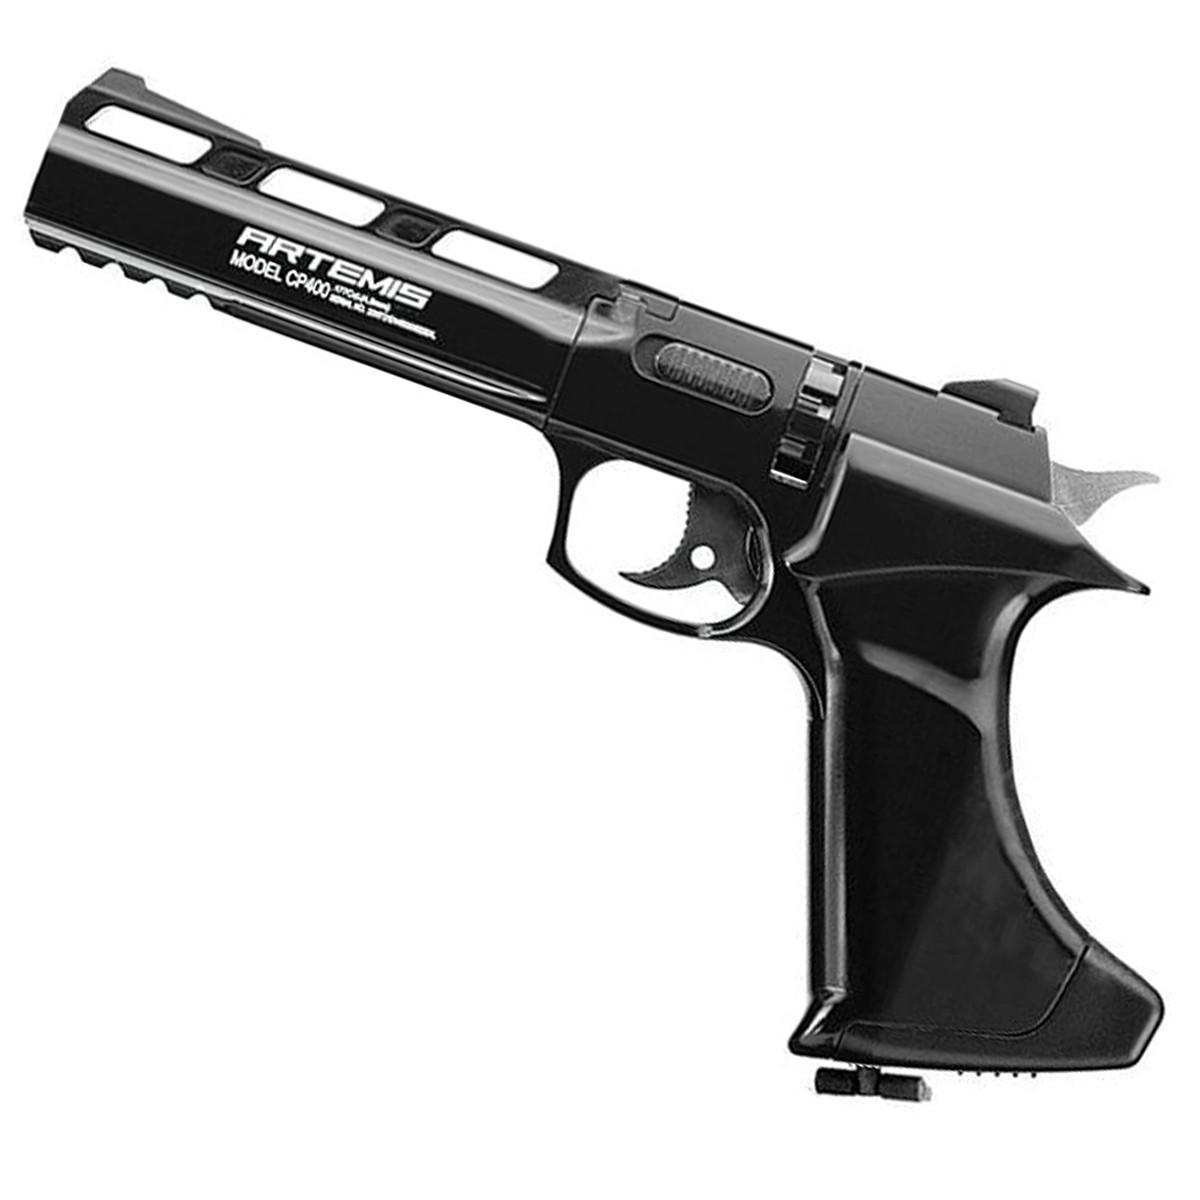 Pistola De Pressão Artemis CP400 Orion CO2 Chumbinho 4.5mm